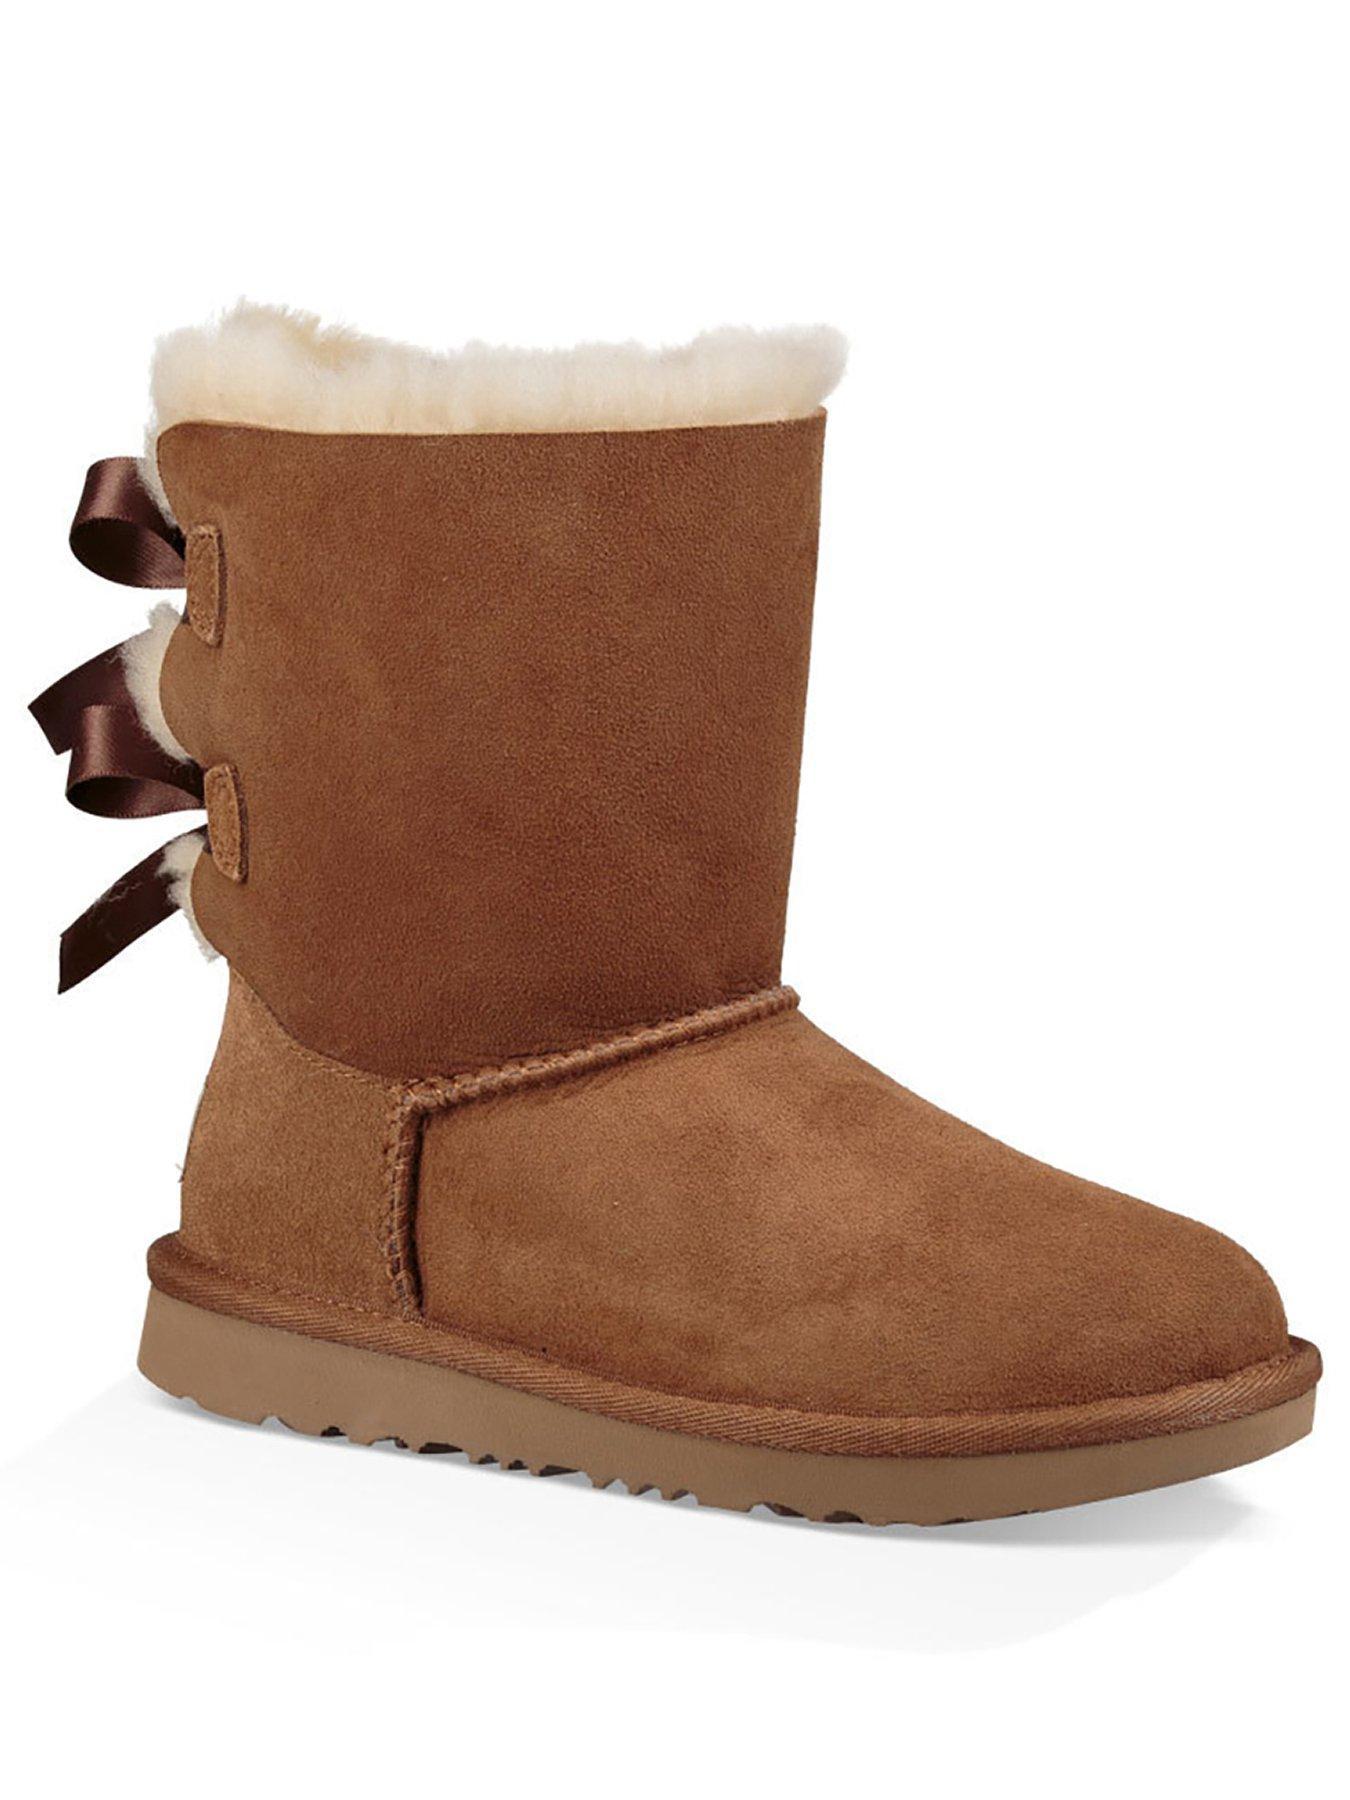 Girls UGG Boots   Girls UGGs